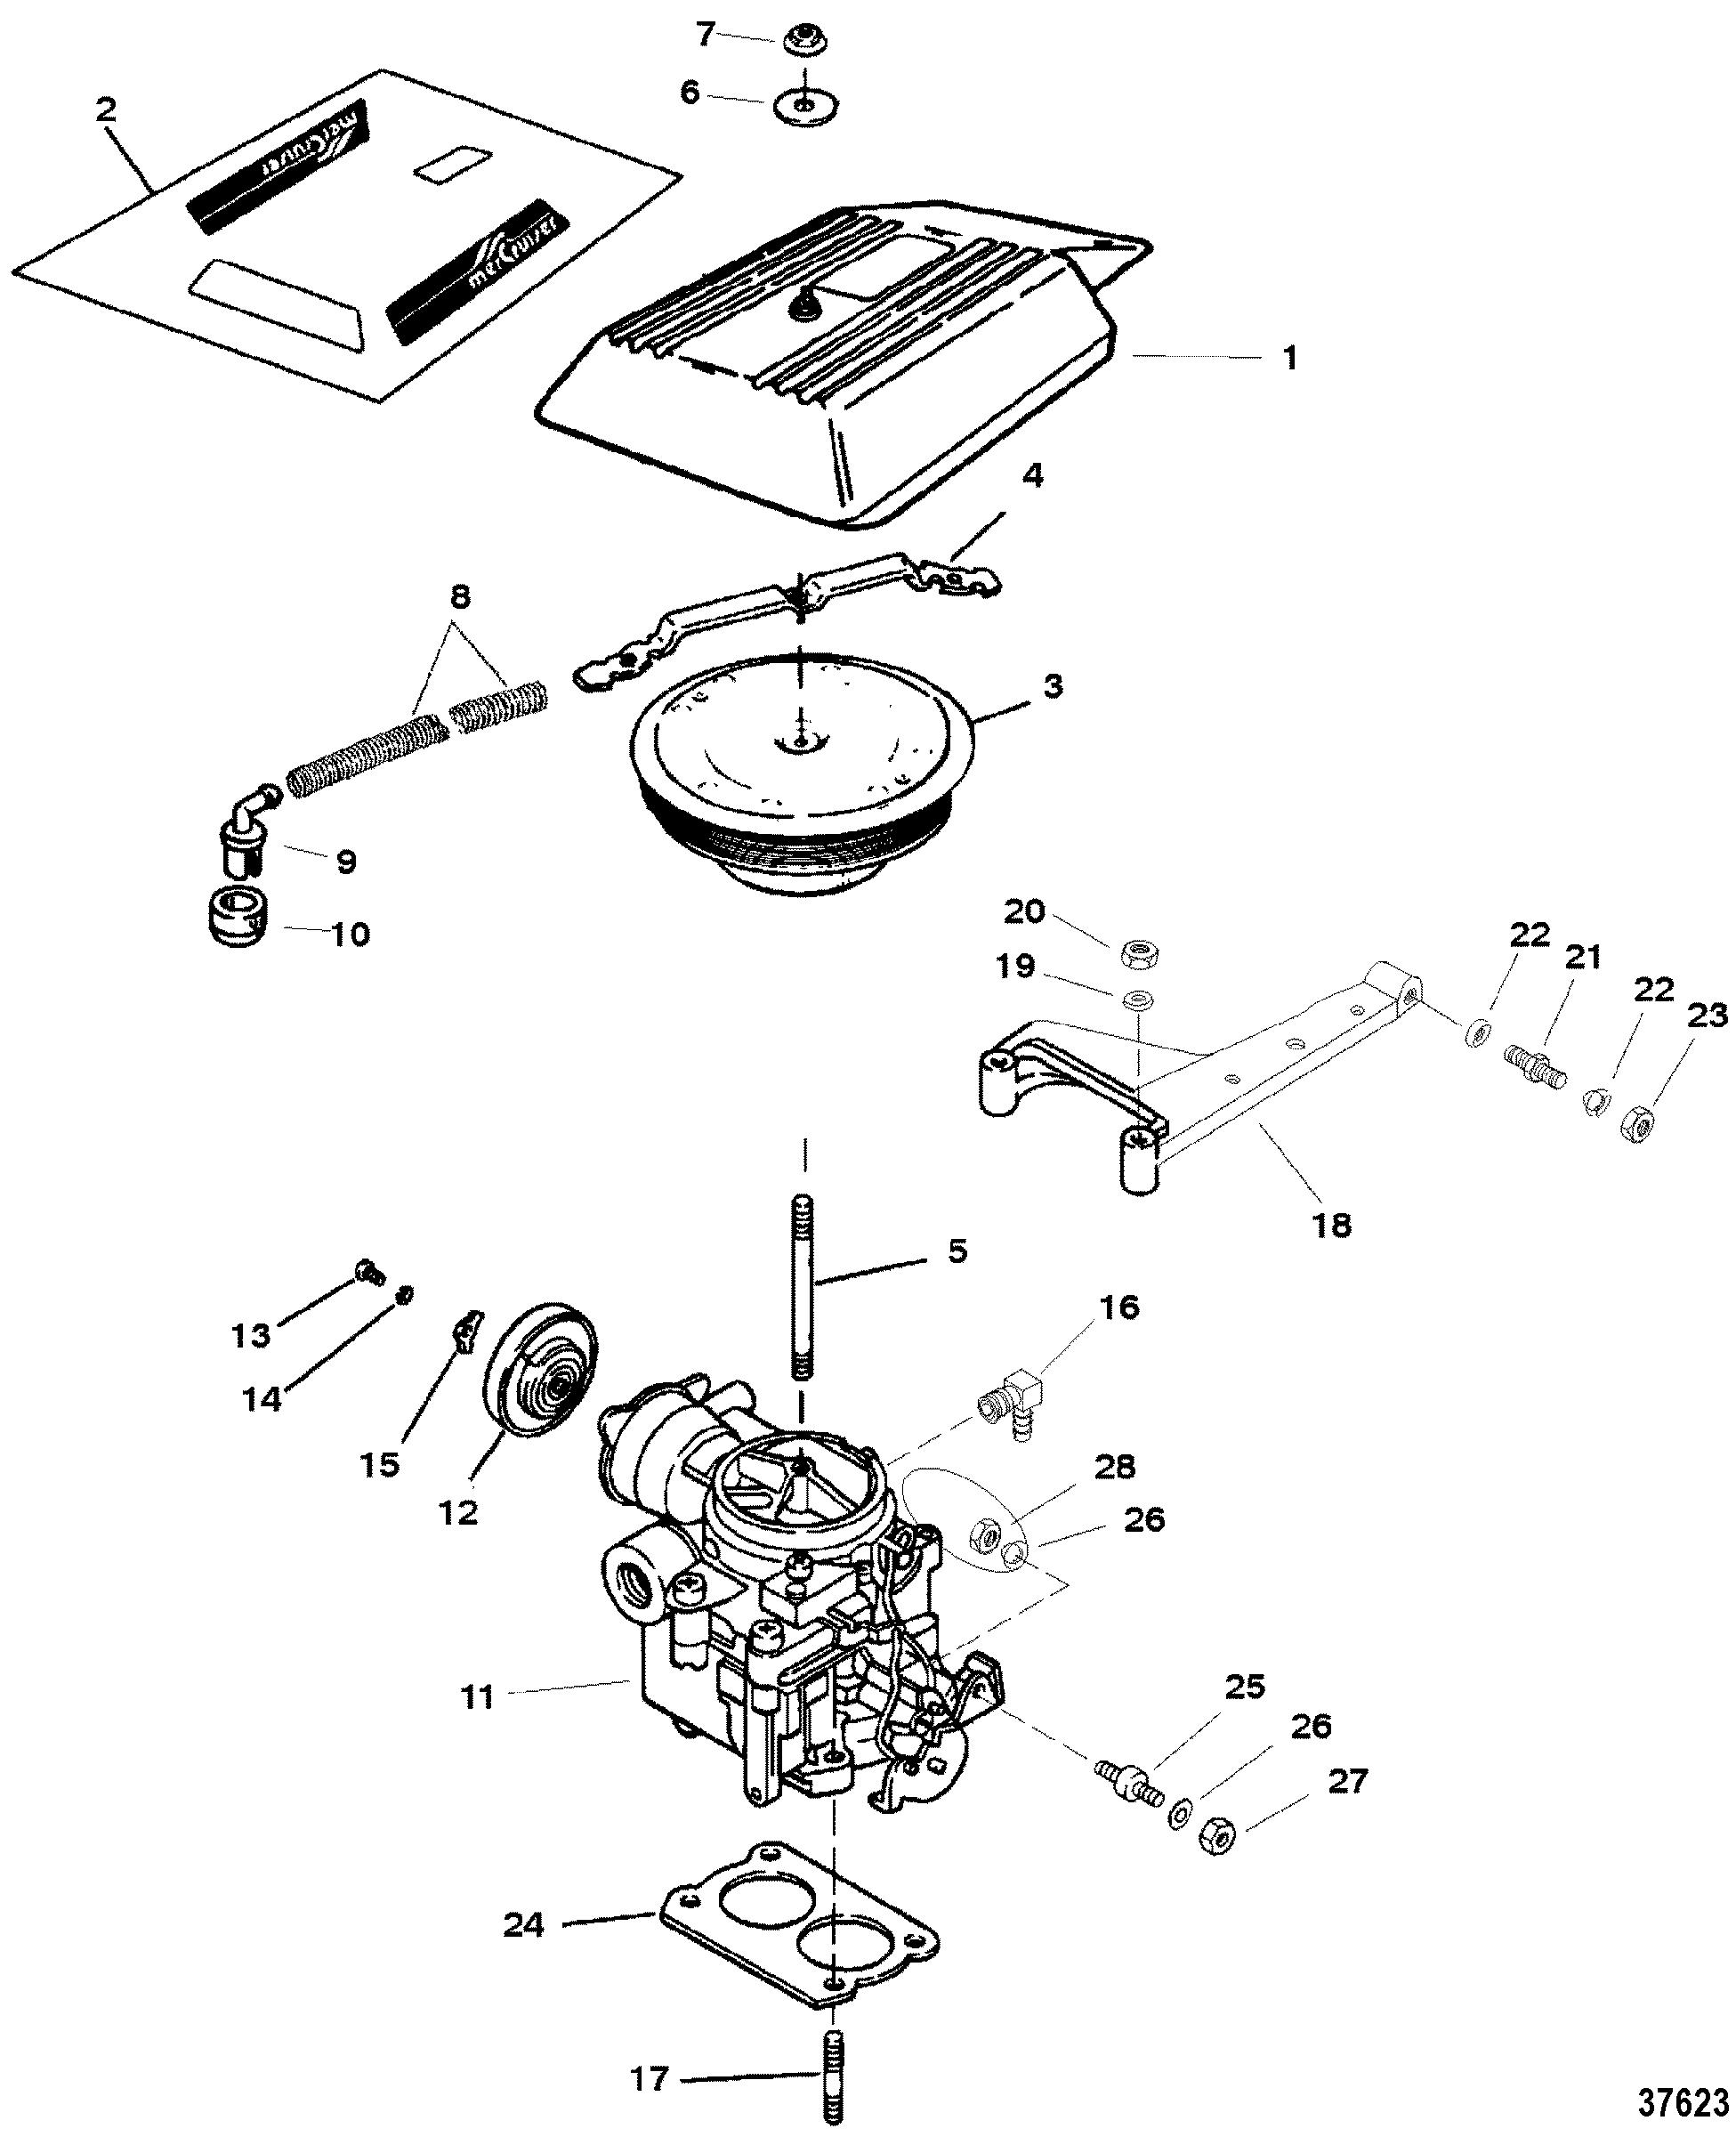 carburetor  throttle linkage 2 barrel for mercruiser 5 7l